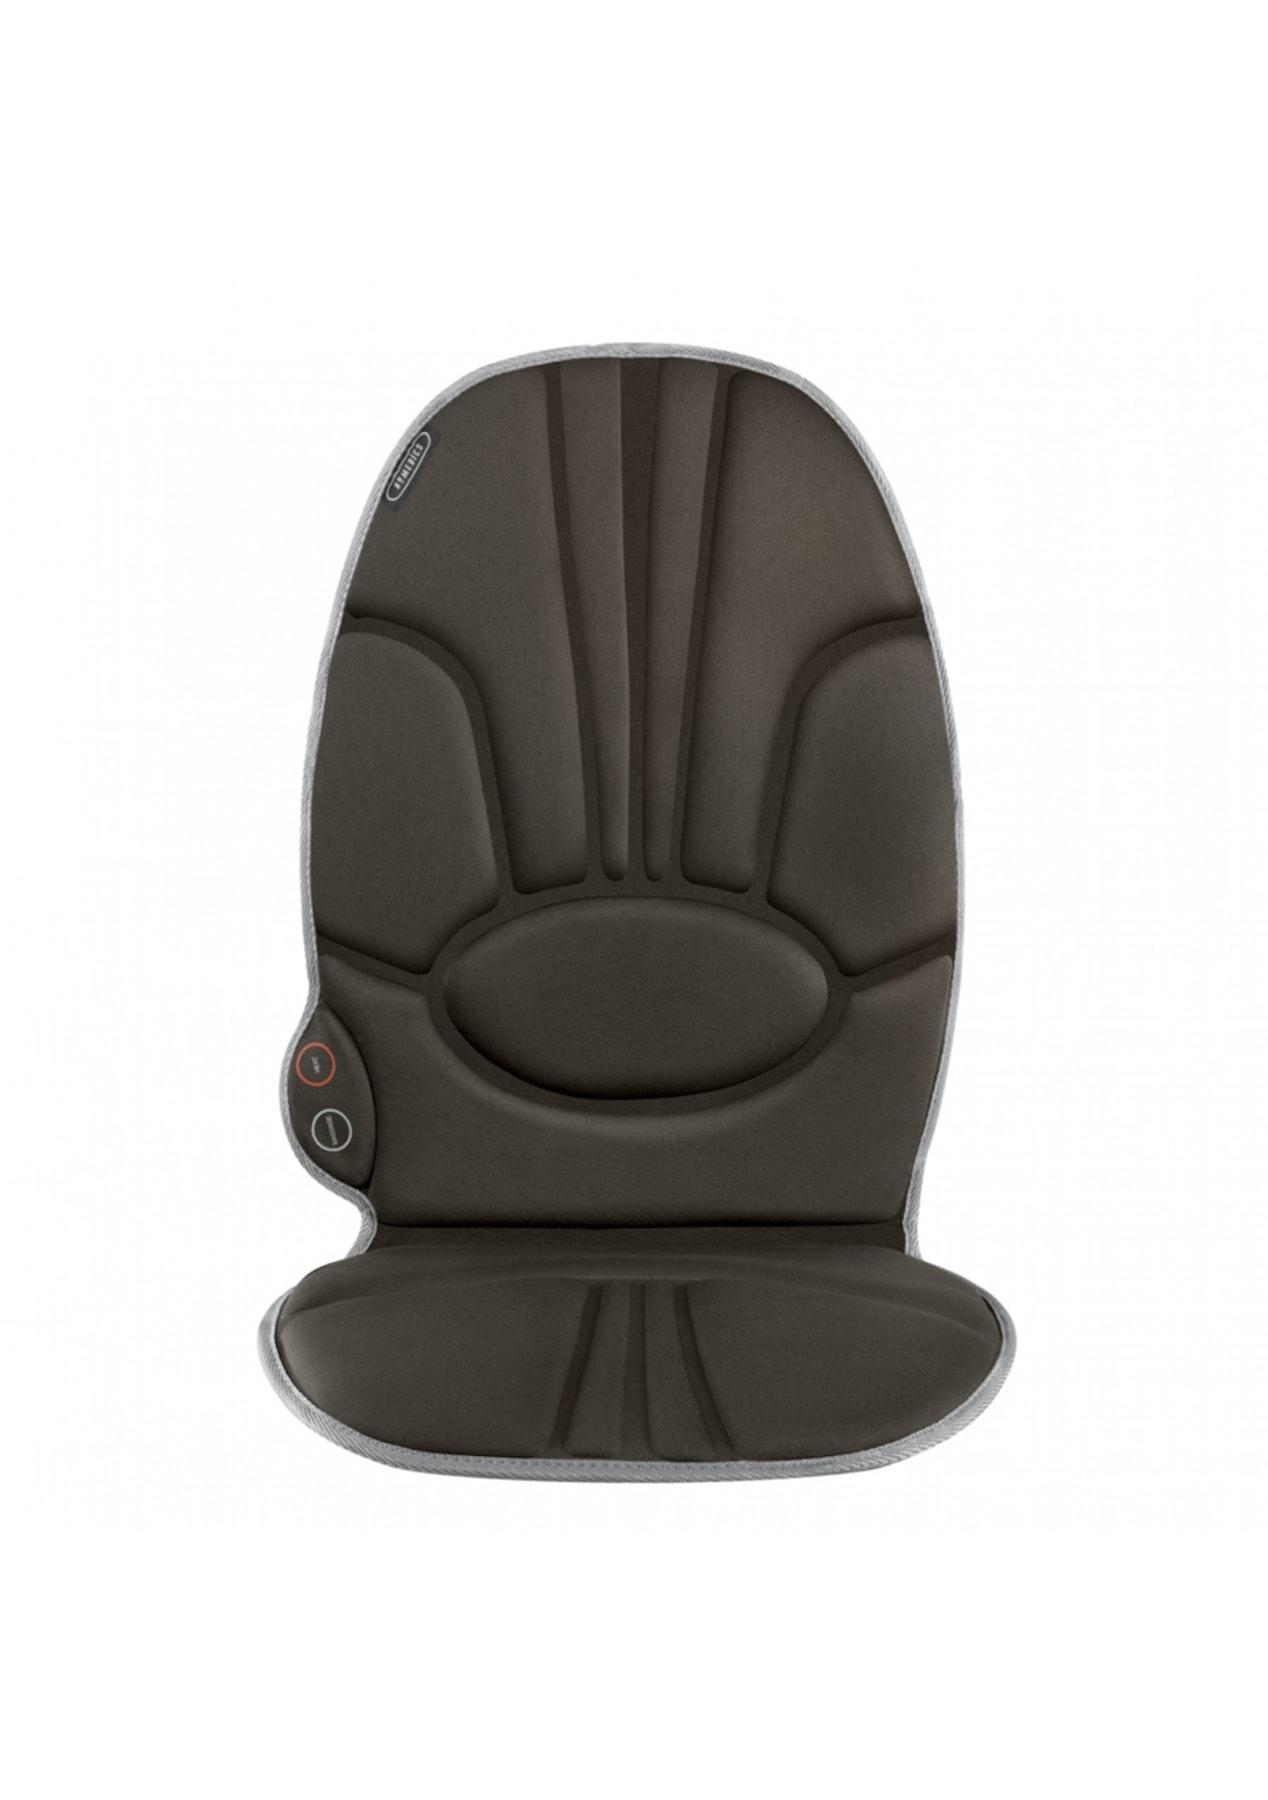 Homedics Comfort Deluxe Massage Cushion With Heat Grey